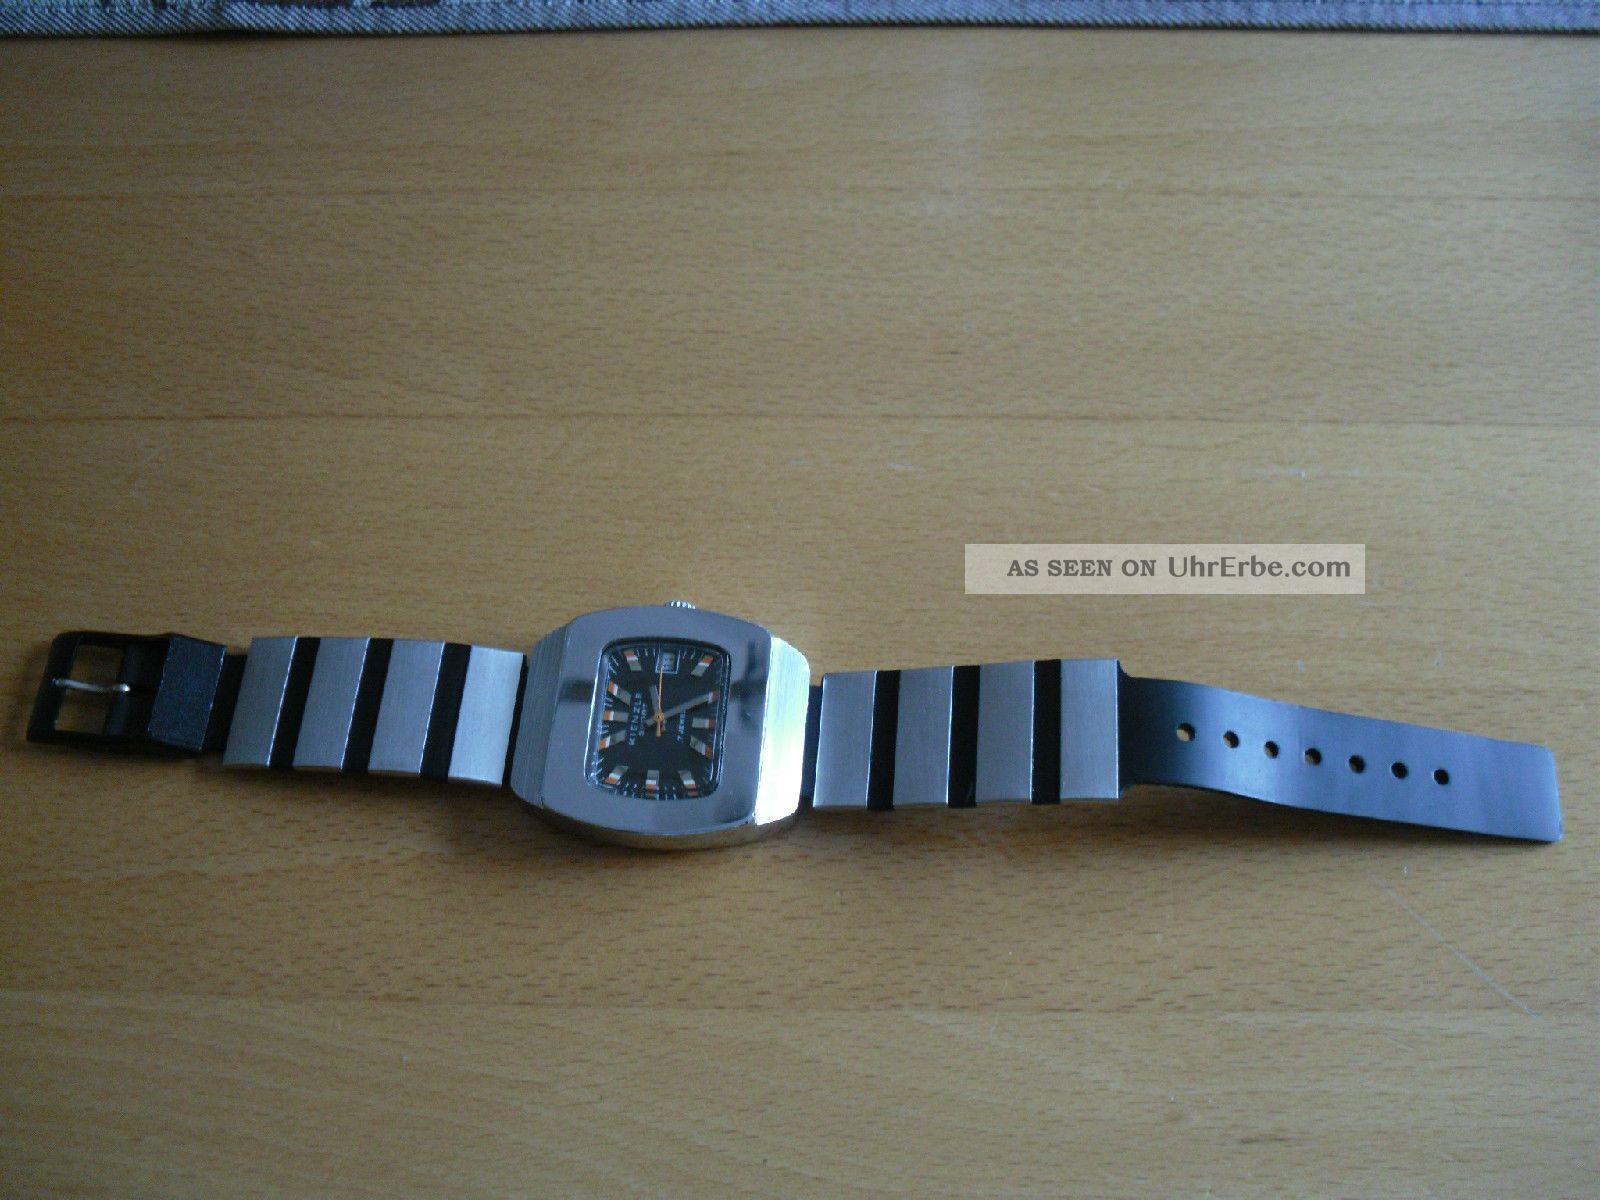 Vintage Kienzle Sport Herren Armbanduhr 70 ' Er Jahre Armbanduhren Bild